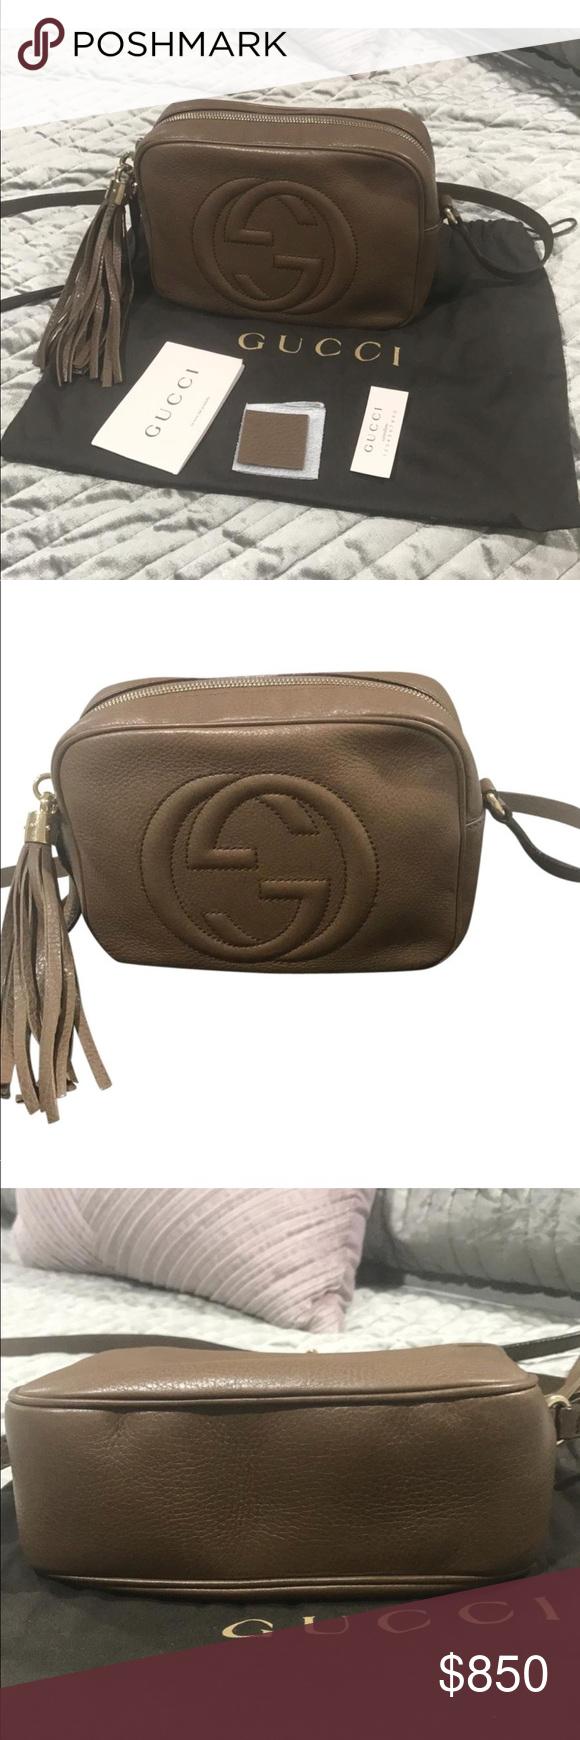 3a6de69e694 Gucci soho disco bag maple brown Gucci soho disco bag color  maple brown  comes with dust bag